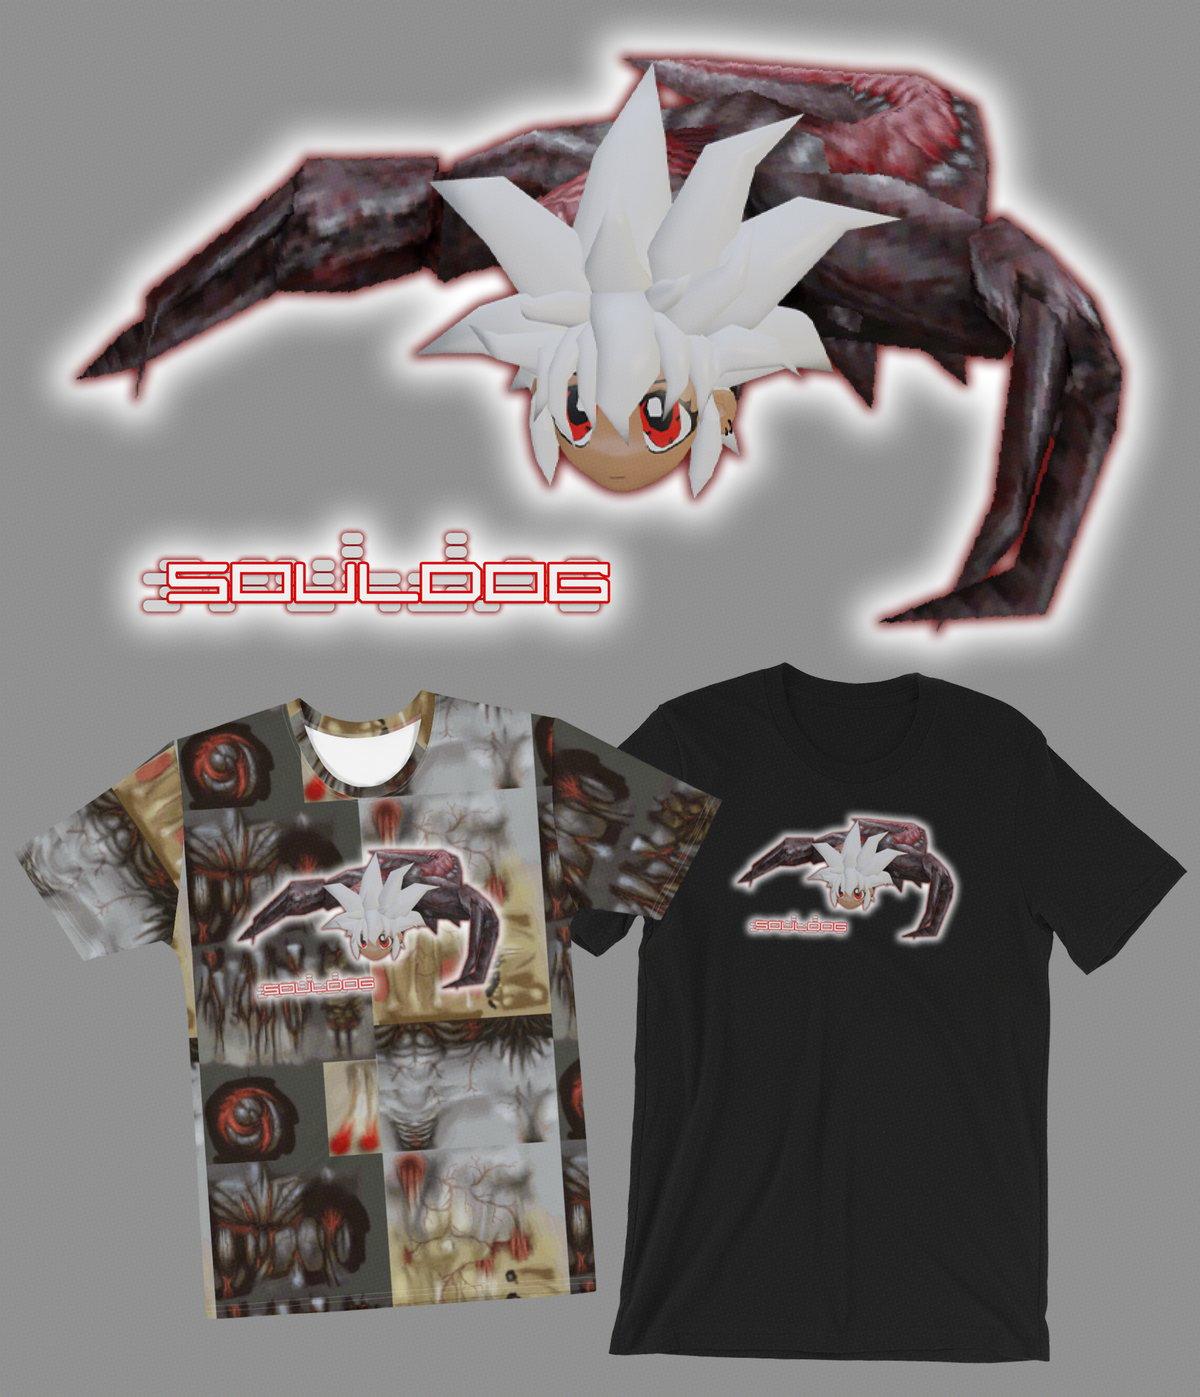 Image of Parasyte T-shirt